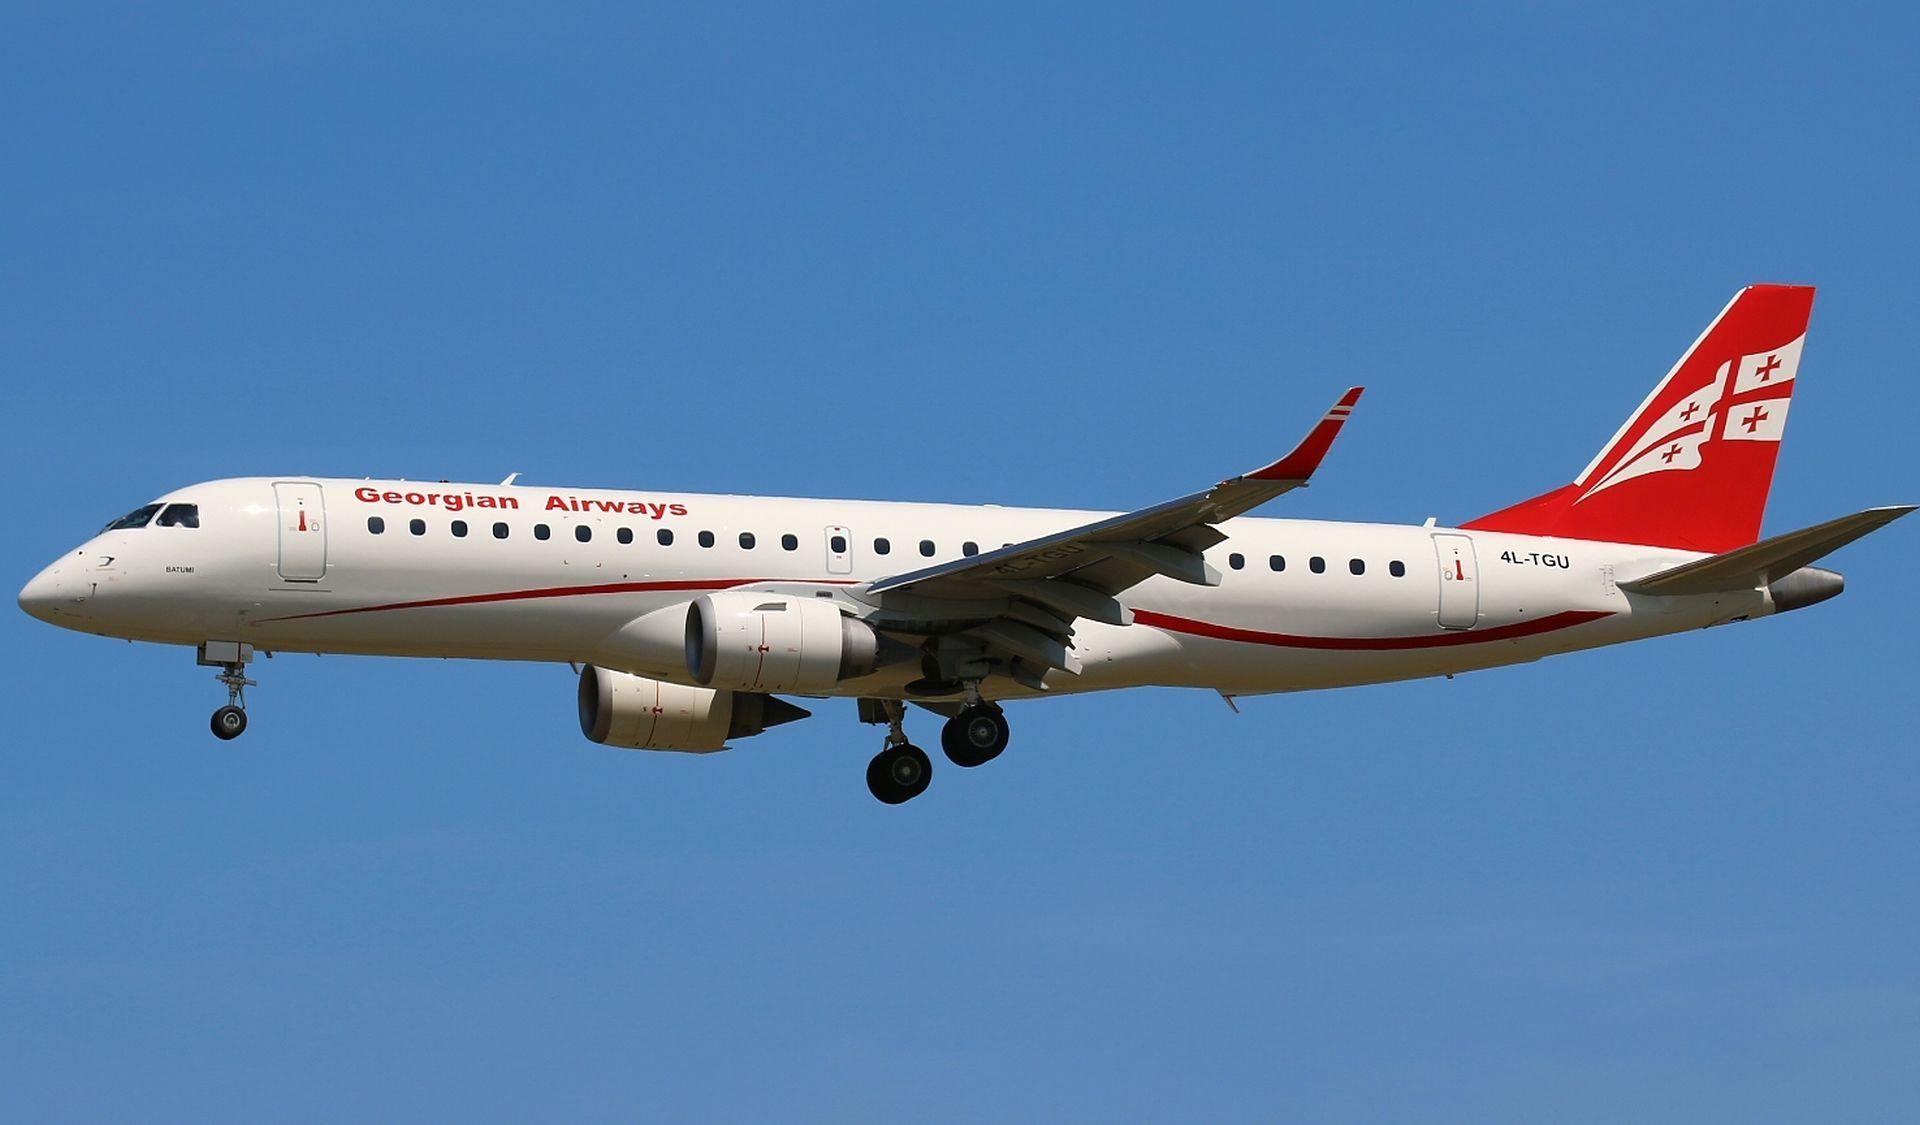 Embraer 190 společnosti Georgian Airways. Foto: Georgian Airways